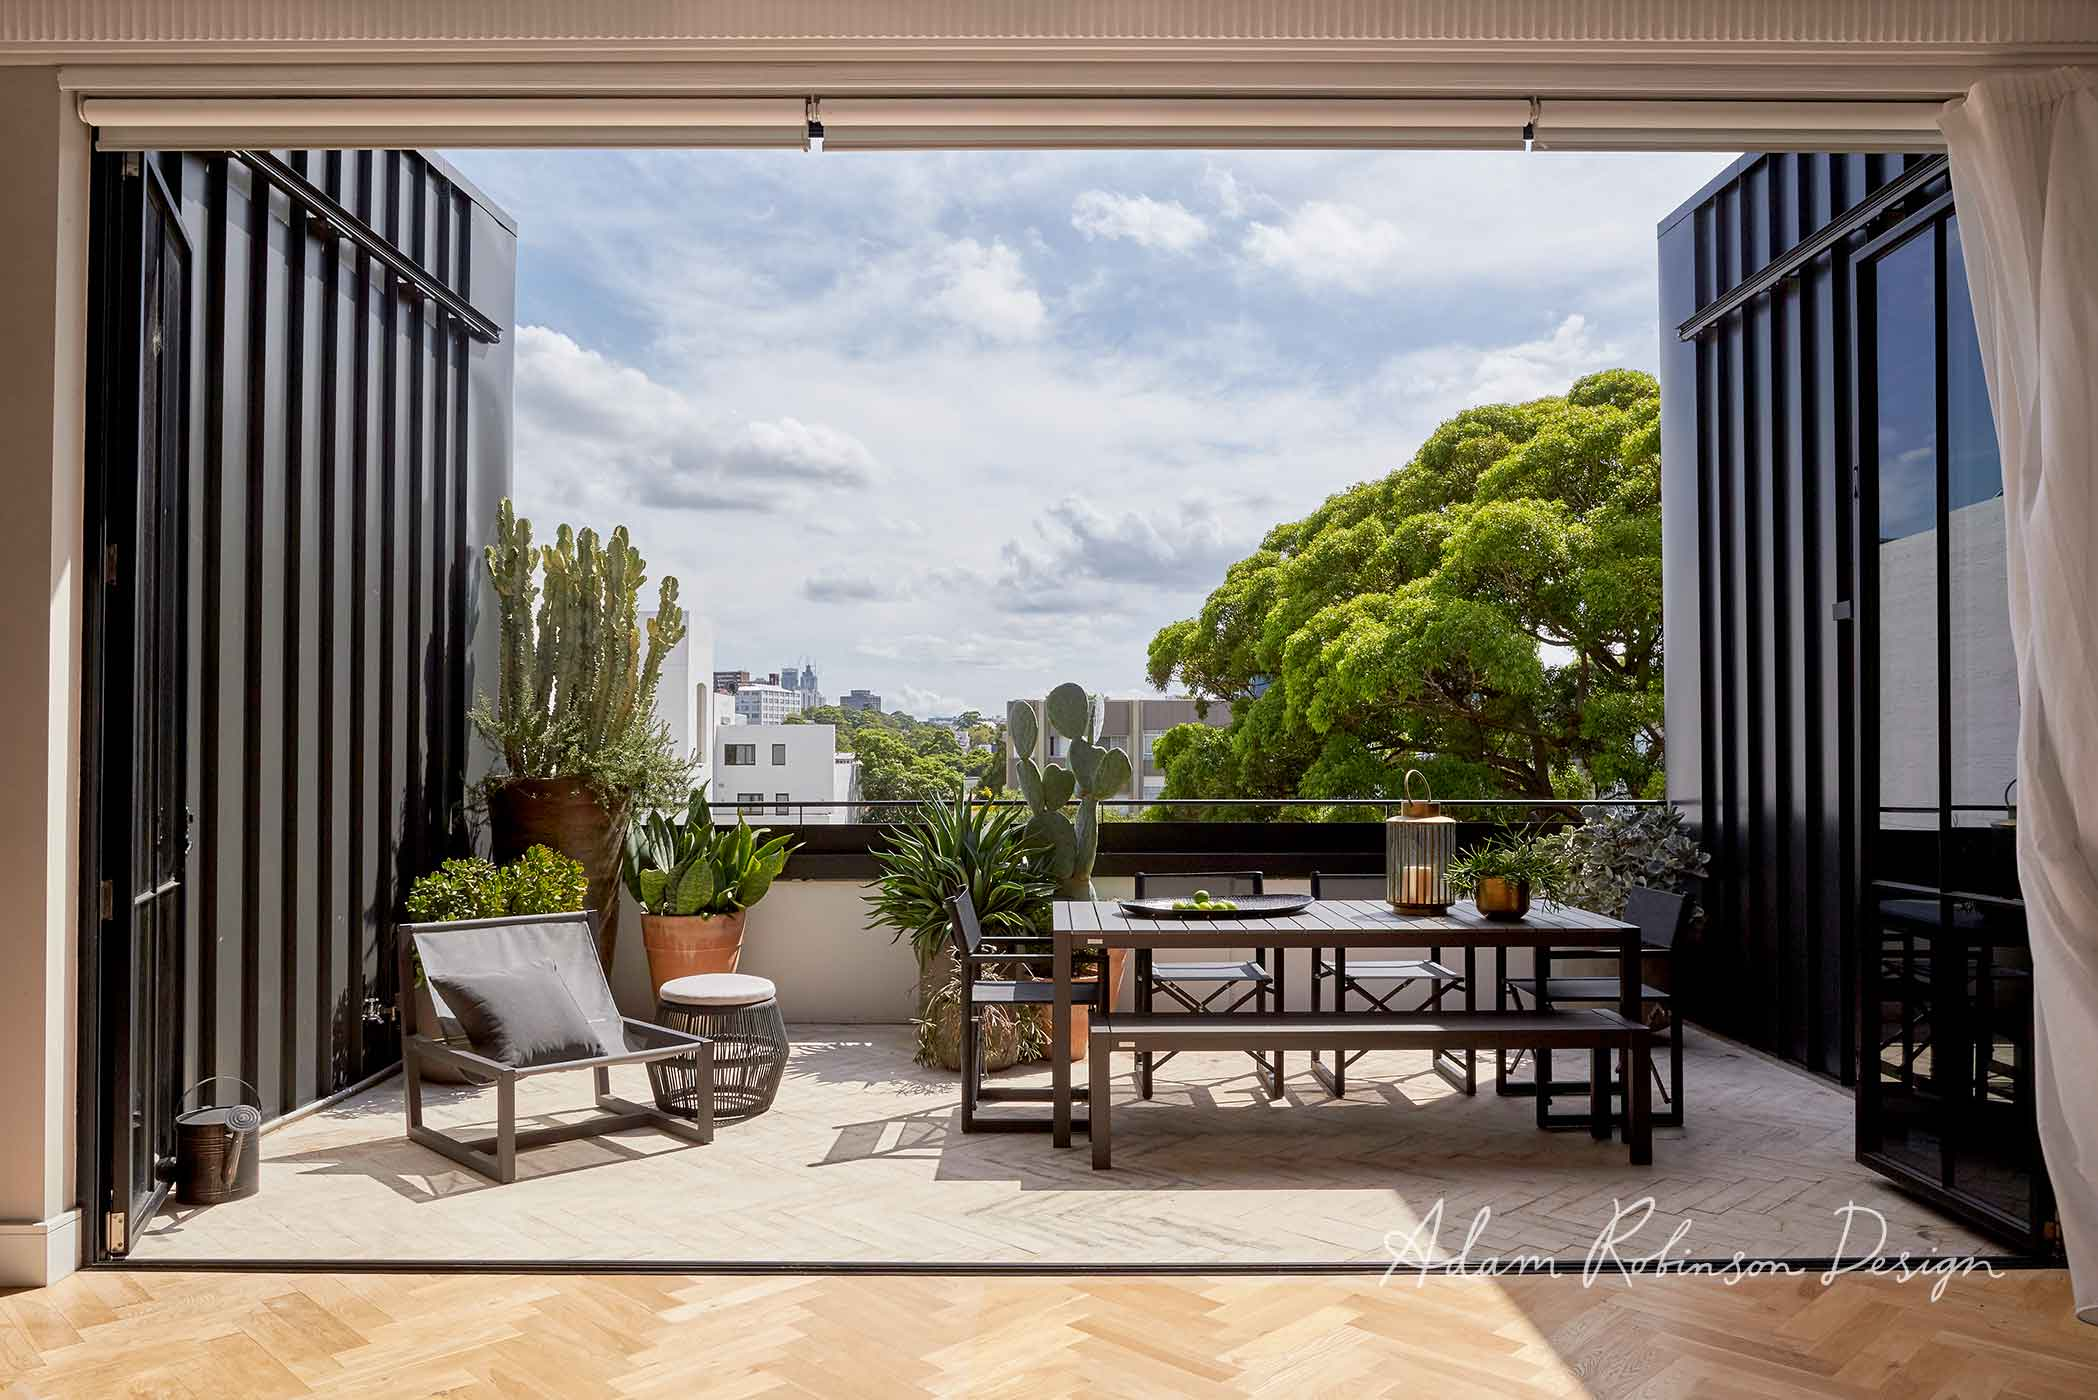 ©-Adam-Robinson-Design-Collaboration-Harbour-Outdoor-1976-One-Balcony-Four-Ways-Stylish.jpg